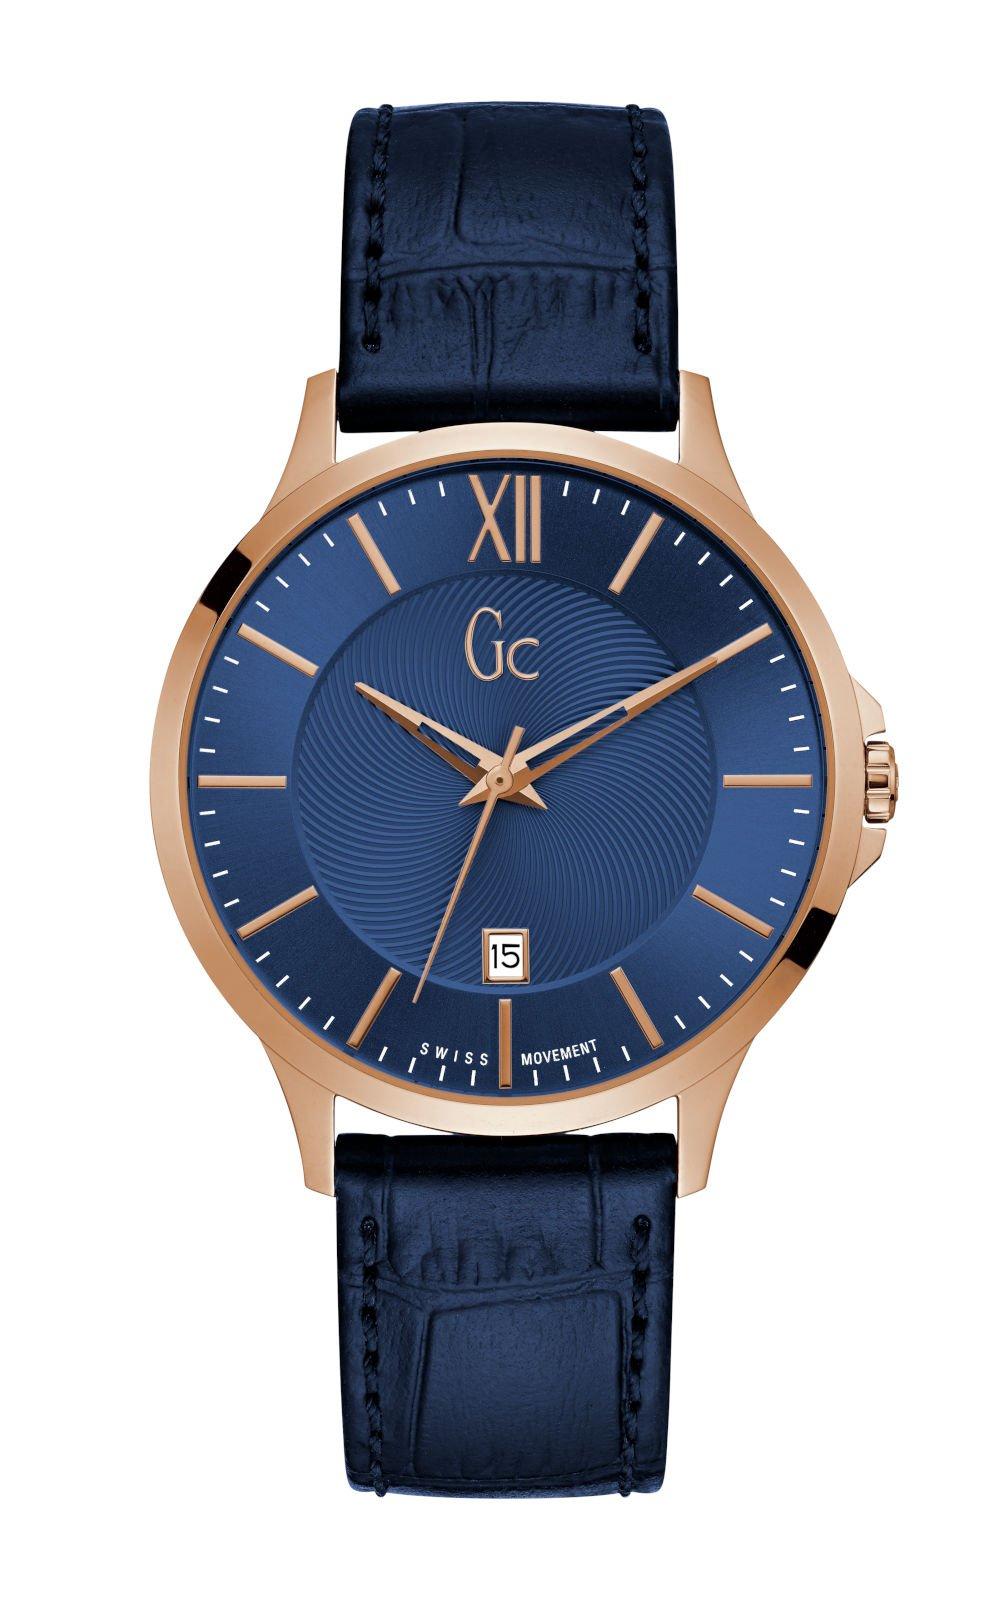 GC Y38002G7 Ανδρικό Ρολόι Quartz Ακριβείας 0fad35b95ac